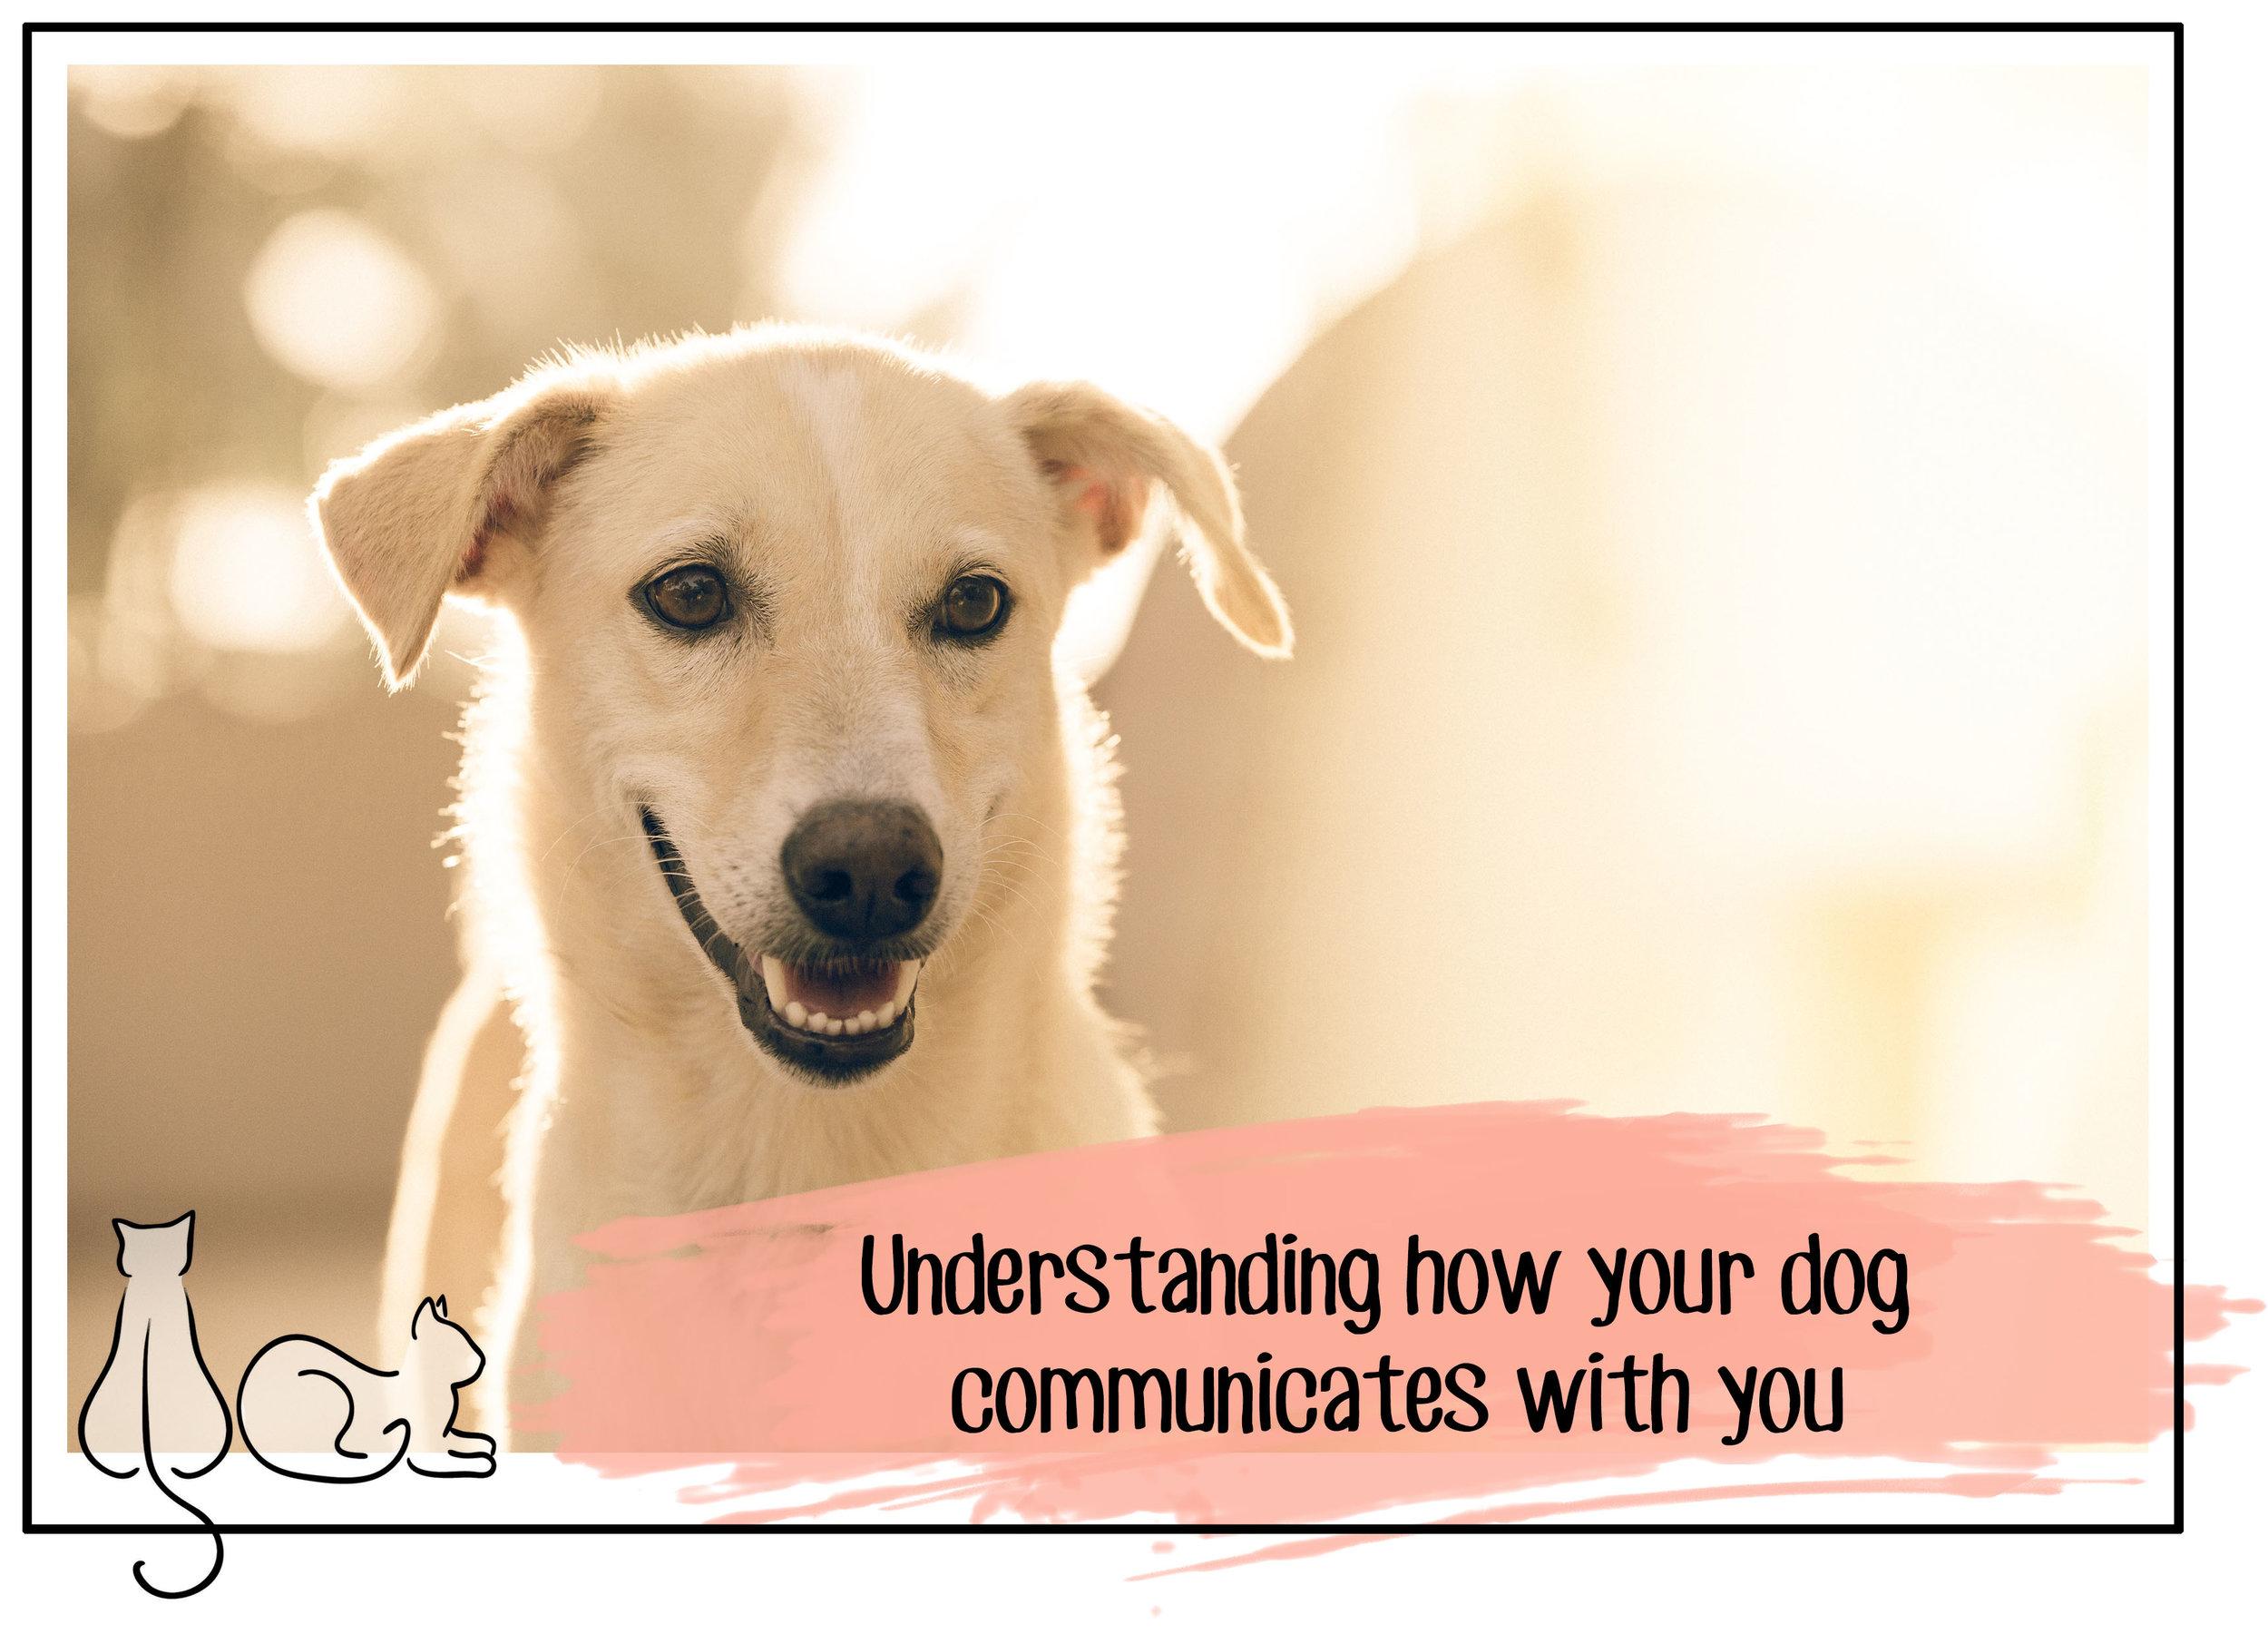 communication header.jpg